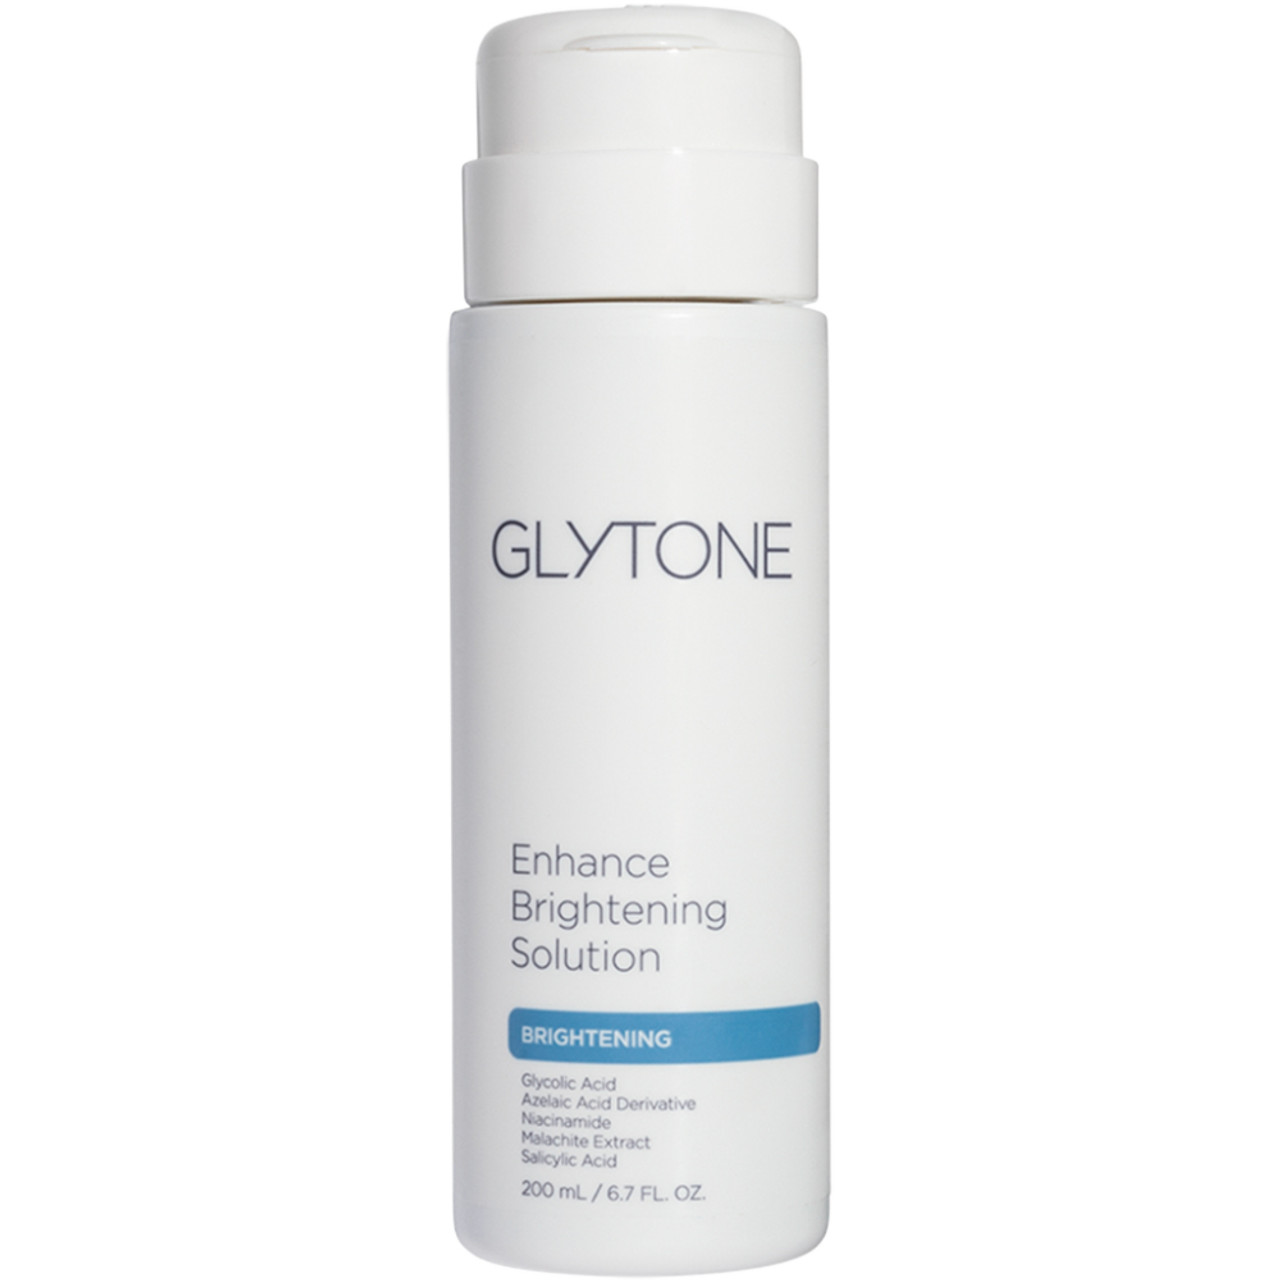 Glytone Enhance Brightening Solution